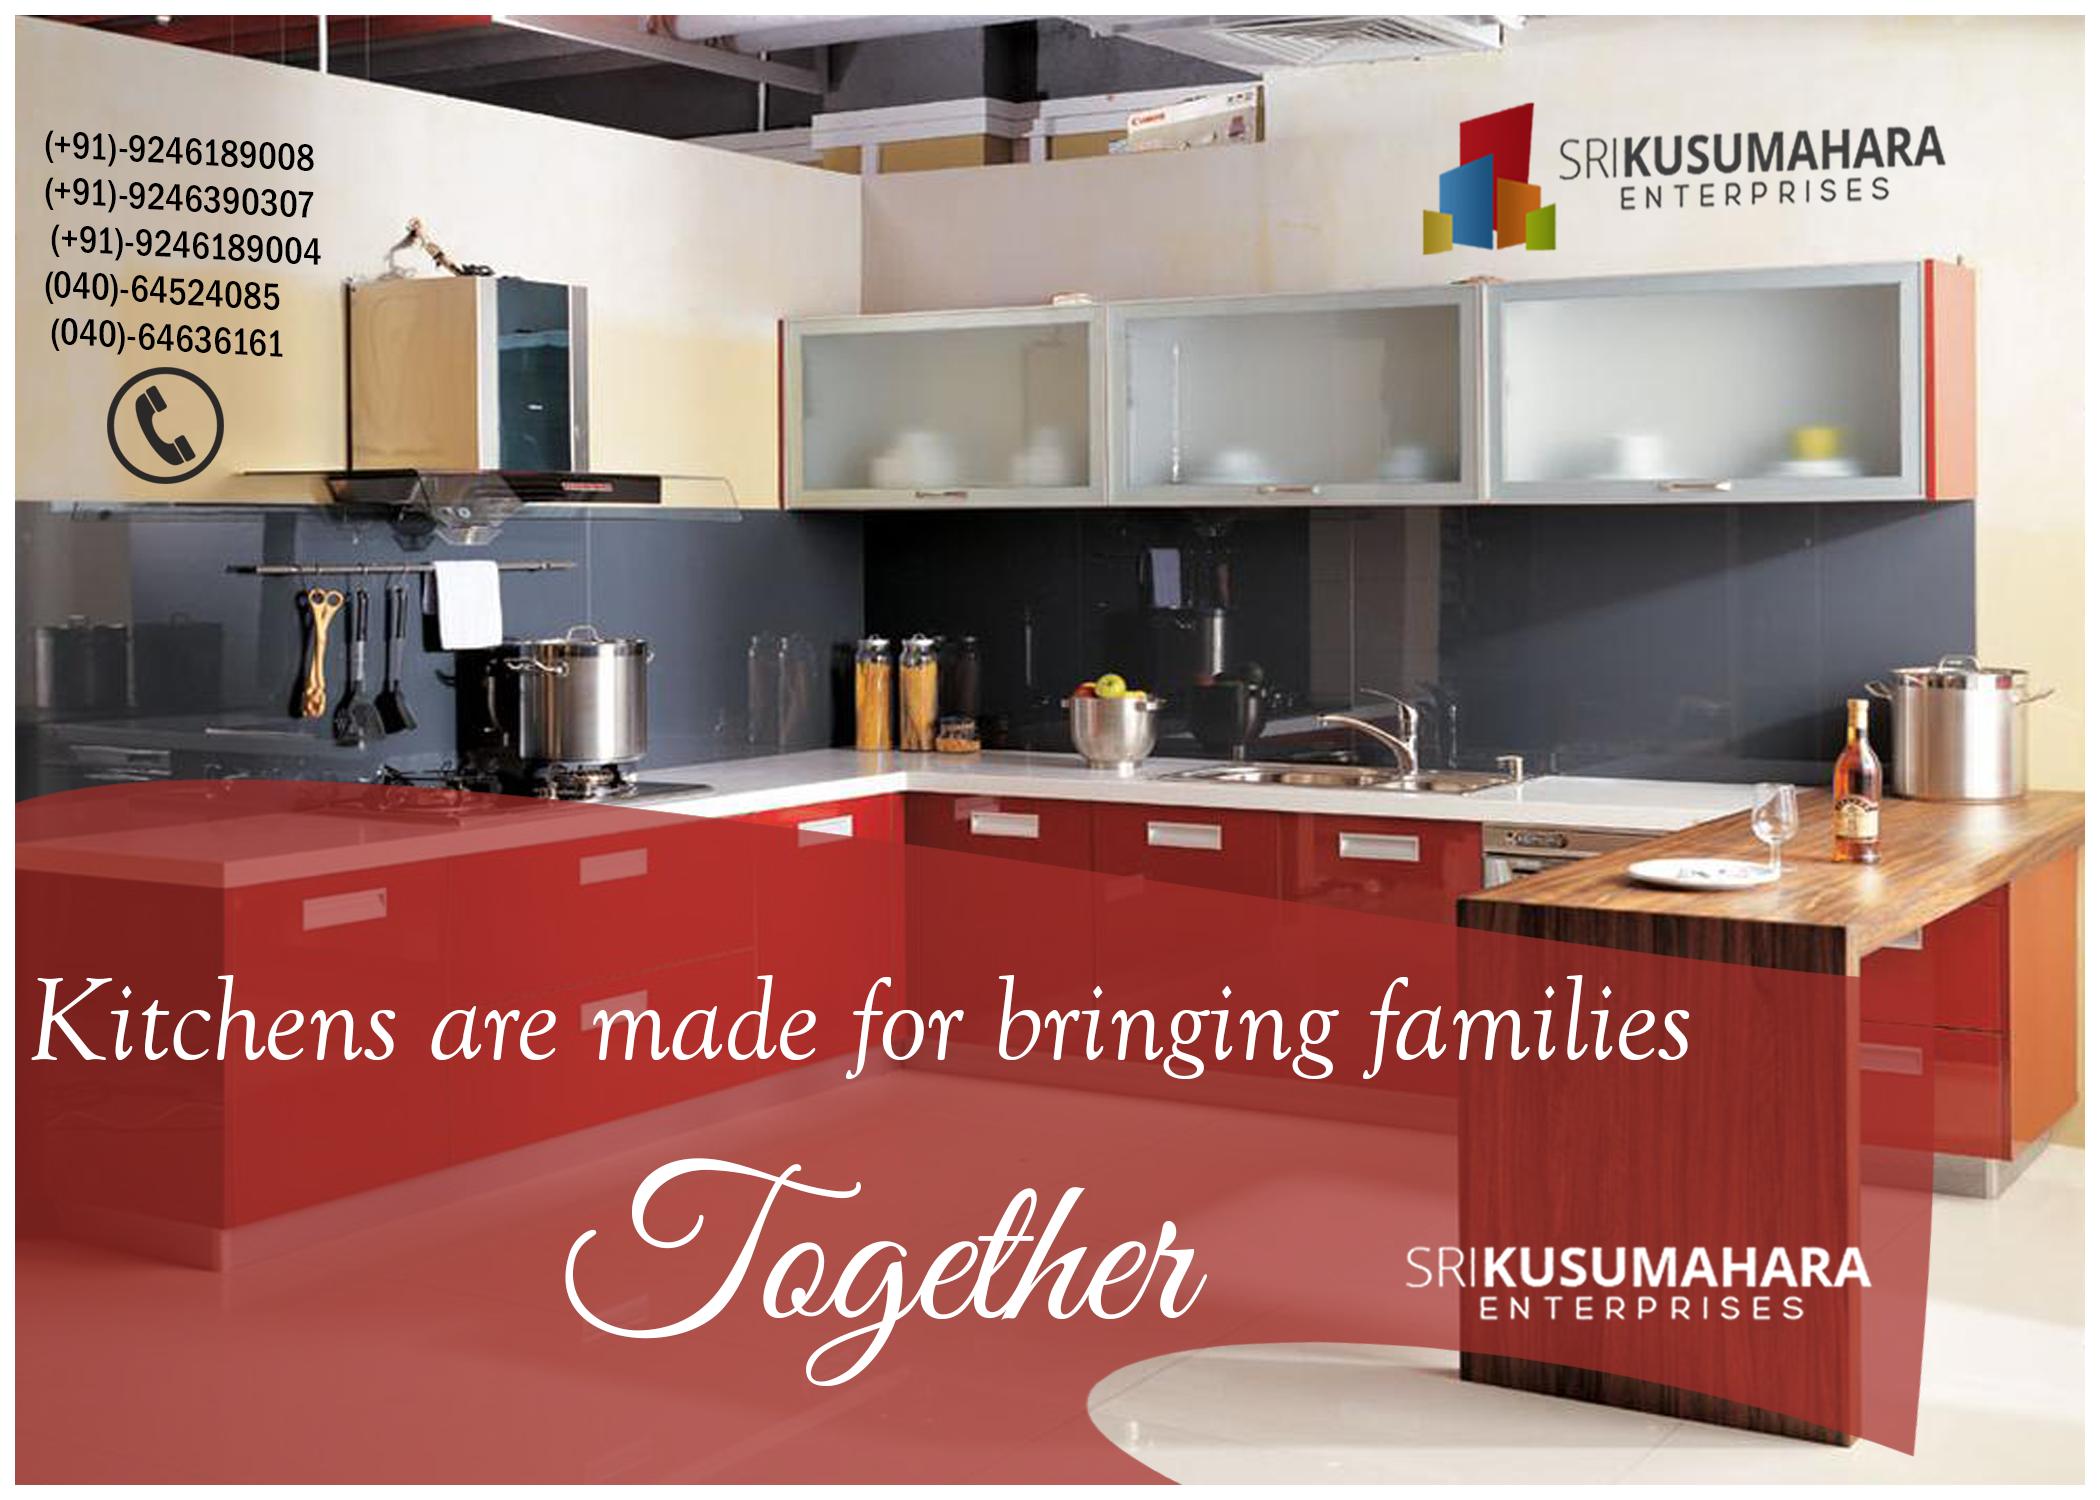 Srikusumahara kitchens are made for bringing families together